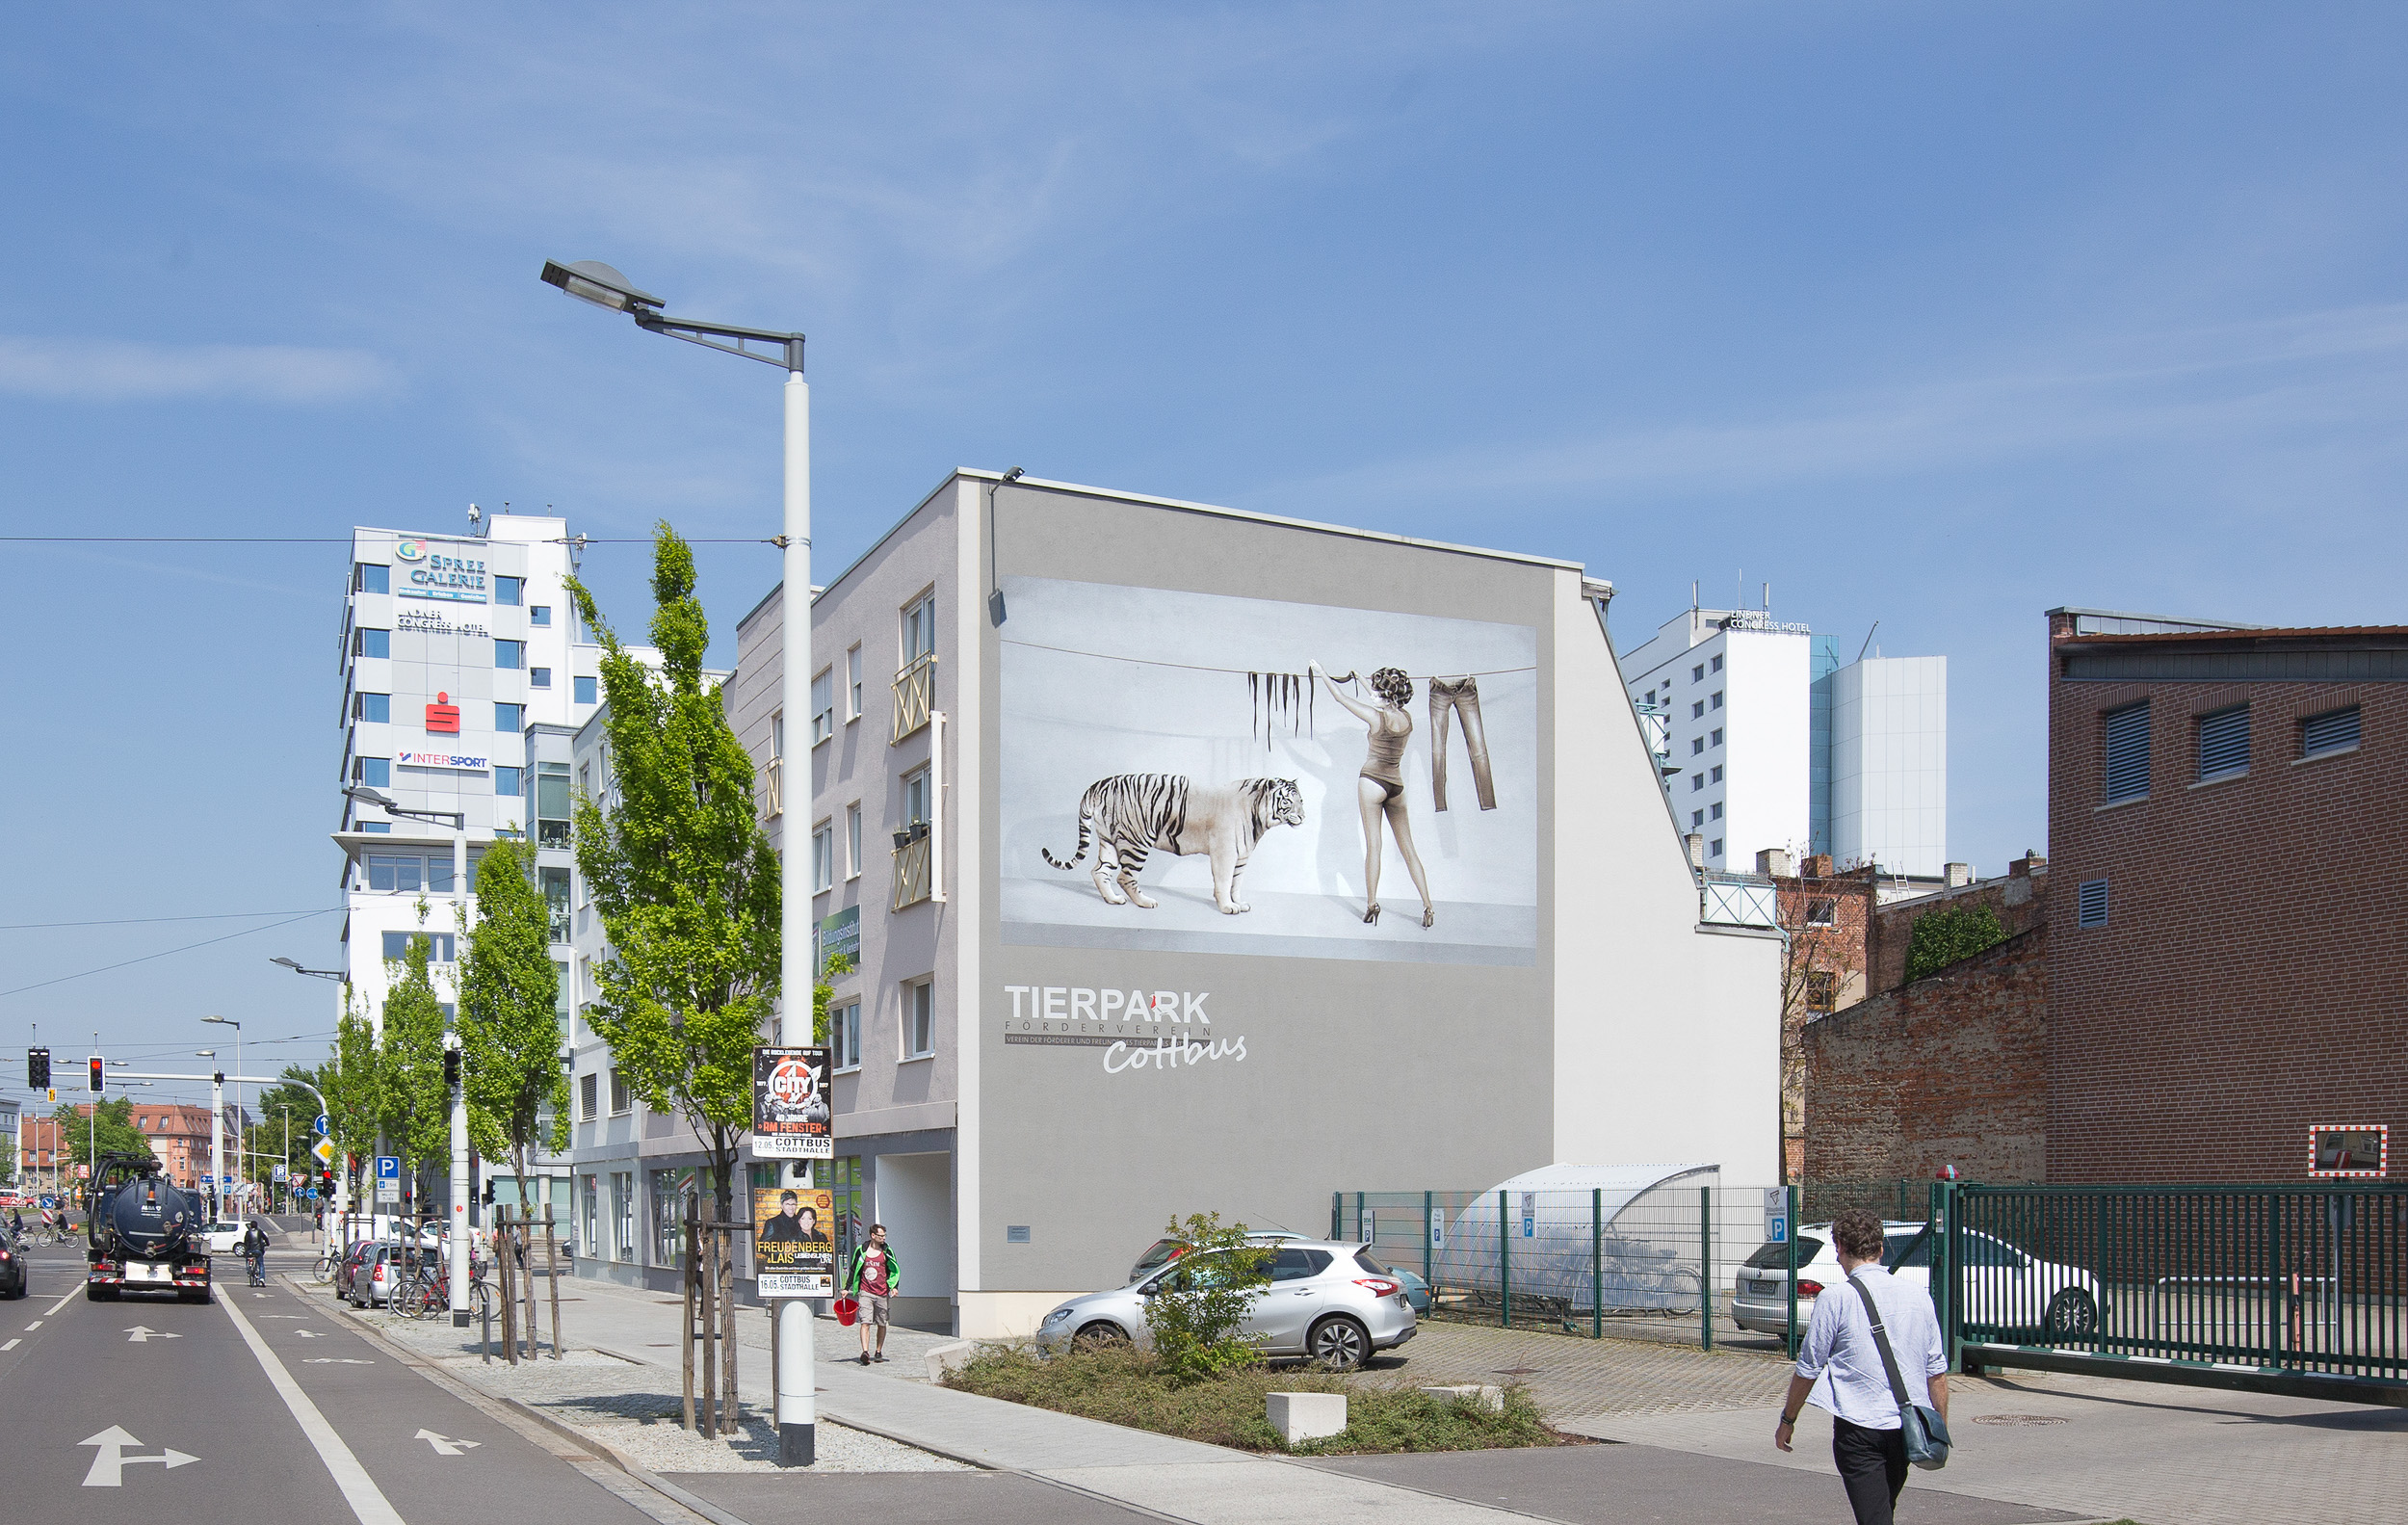 Fassadengestaltung-kein-graffiti-tiger-lily-cottbus-wandbild.jpg